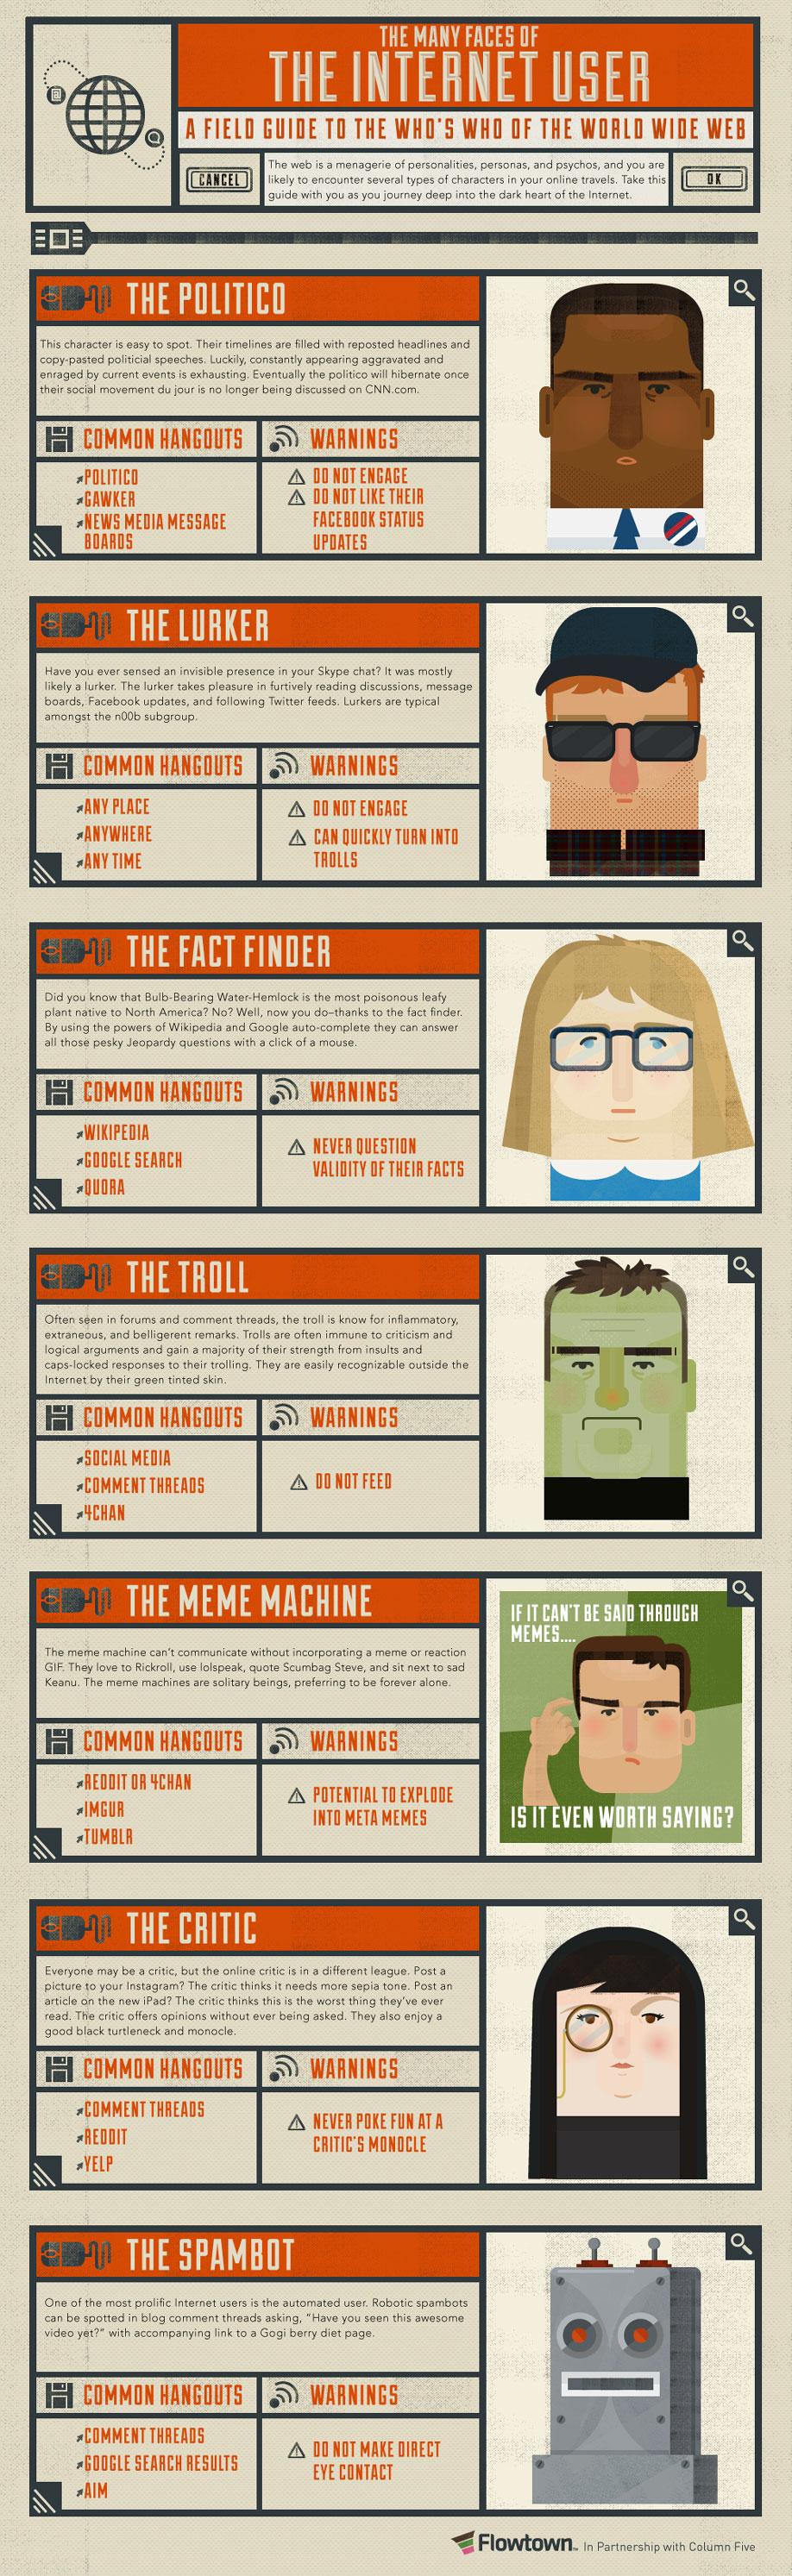 Les 7 types d'internautes